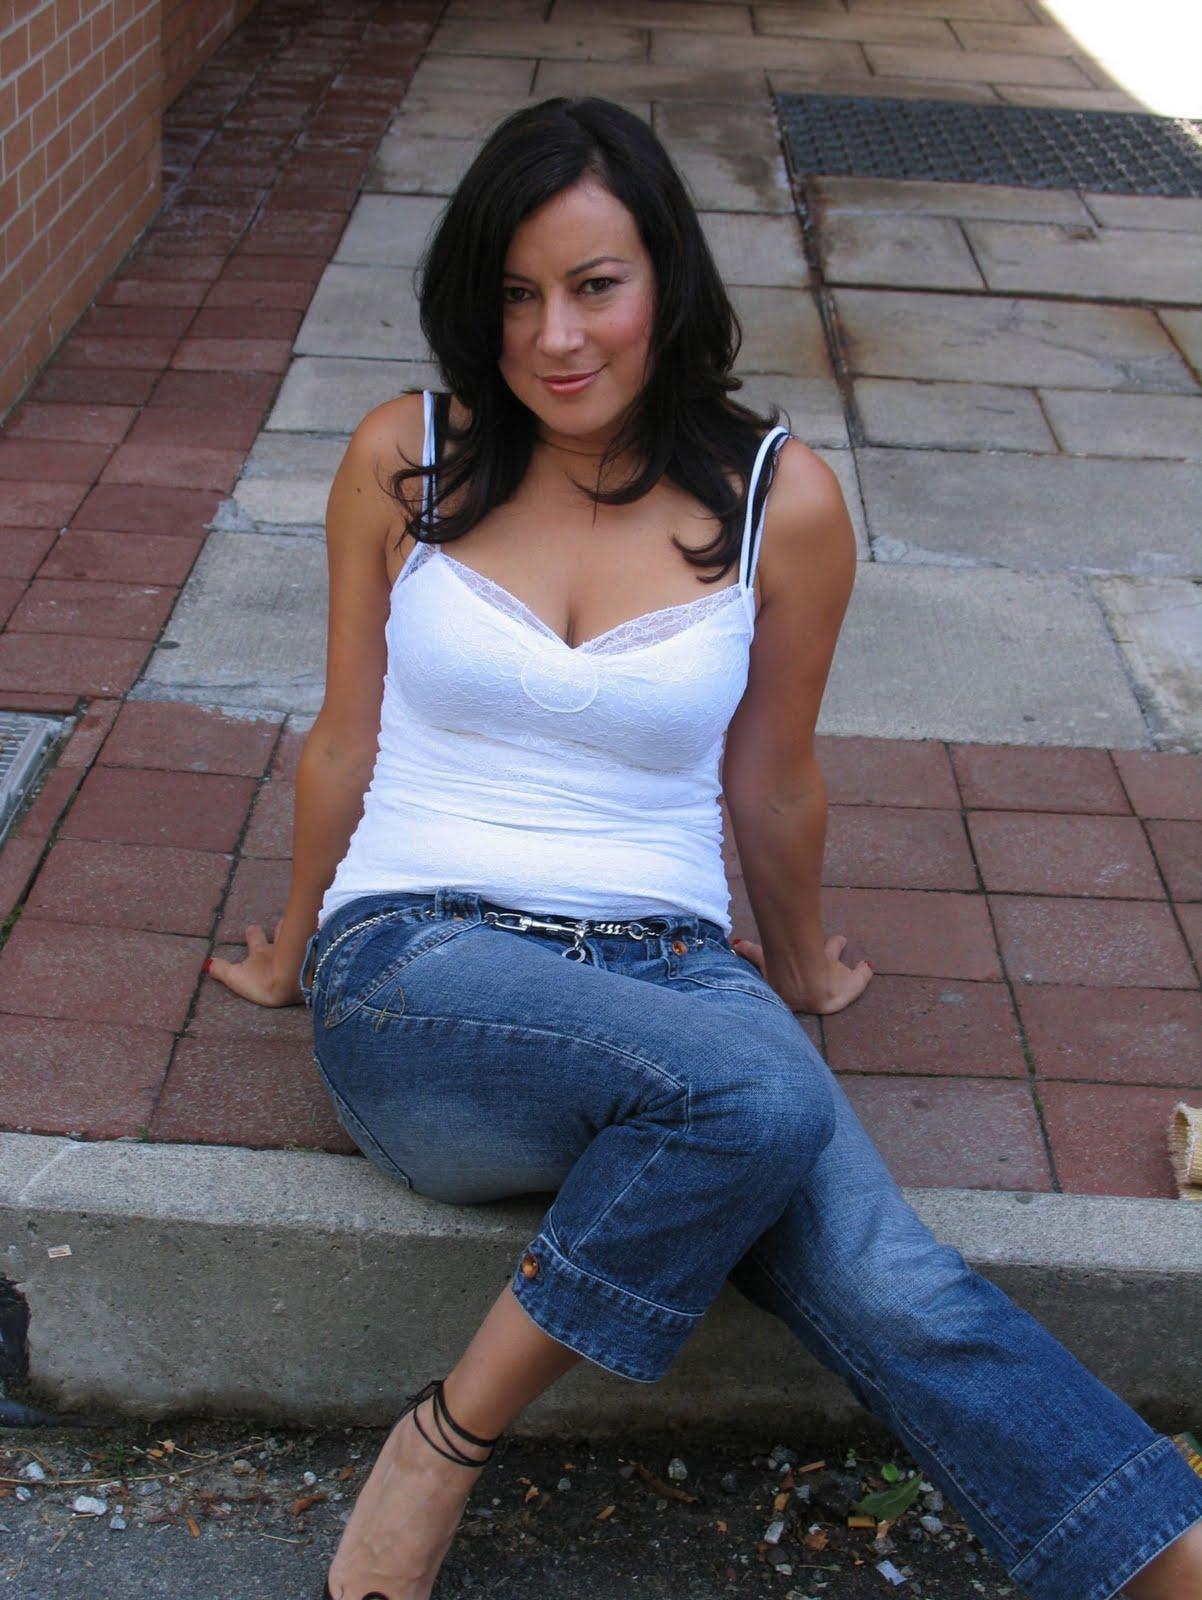 http://3.bp.blogspot.com/-ygIt-pP-oK8/TnLdeh7fy0I/AAAAAAAAB74/18H7Lx-Y0g8/s1600/jennifer+tilly+0517.jpg